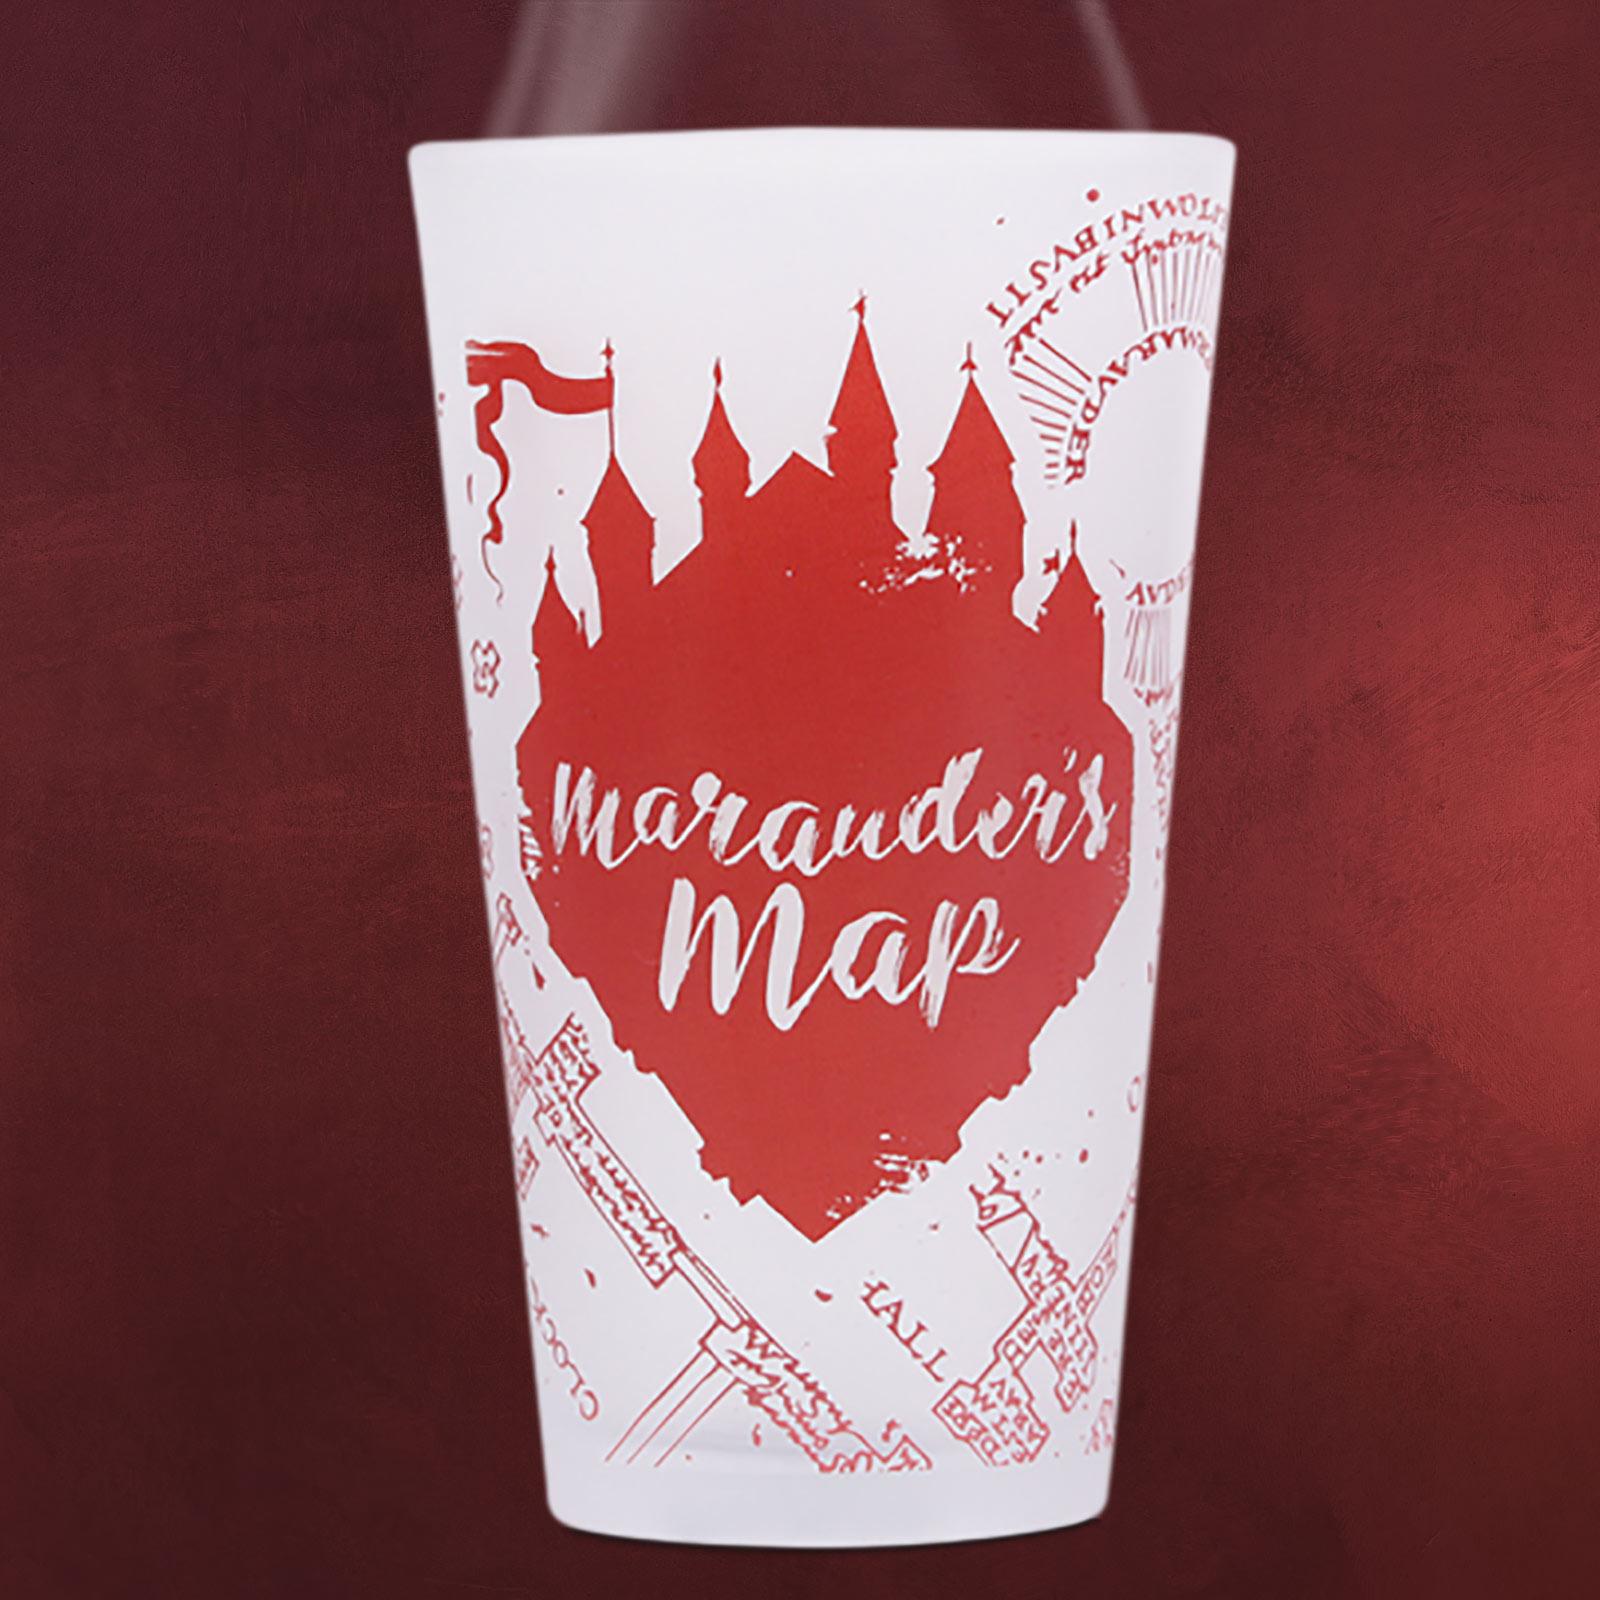 Harry Potter Marauders Map Kälteeffekt Glas Elbenwald